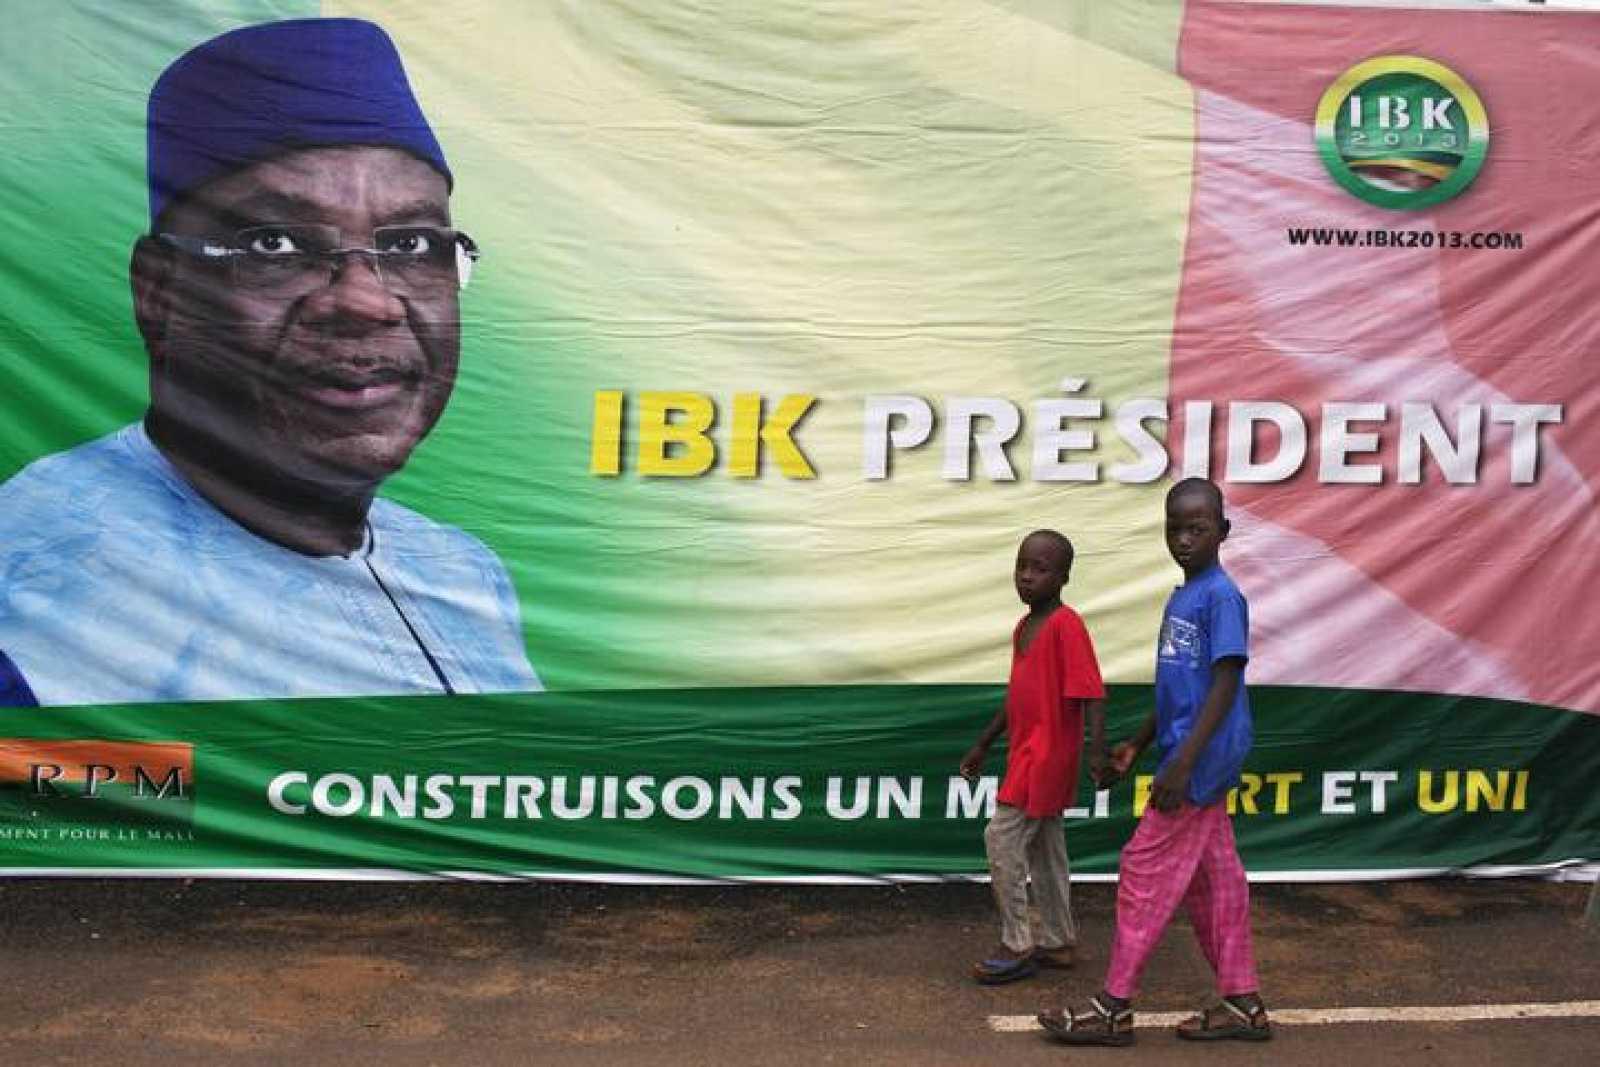 Cartel electoral de Ibrahim Boubacar Keita en Bamako, Mali